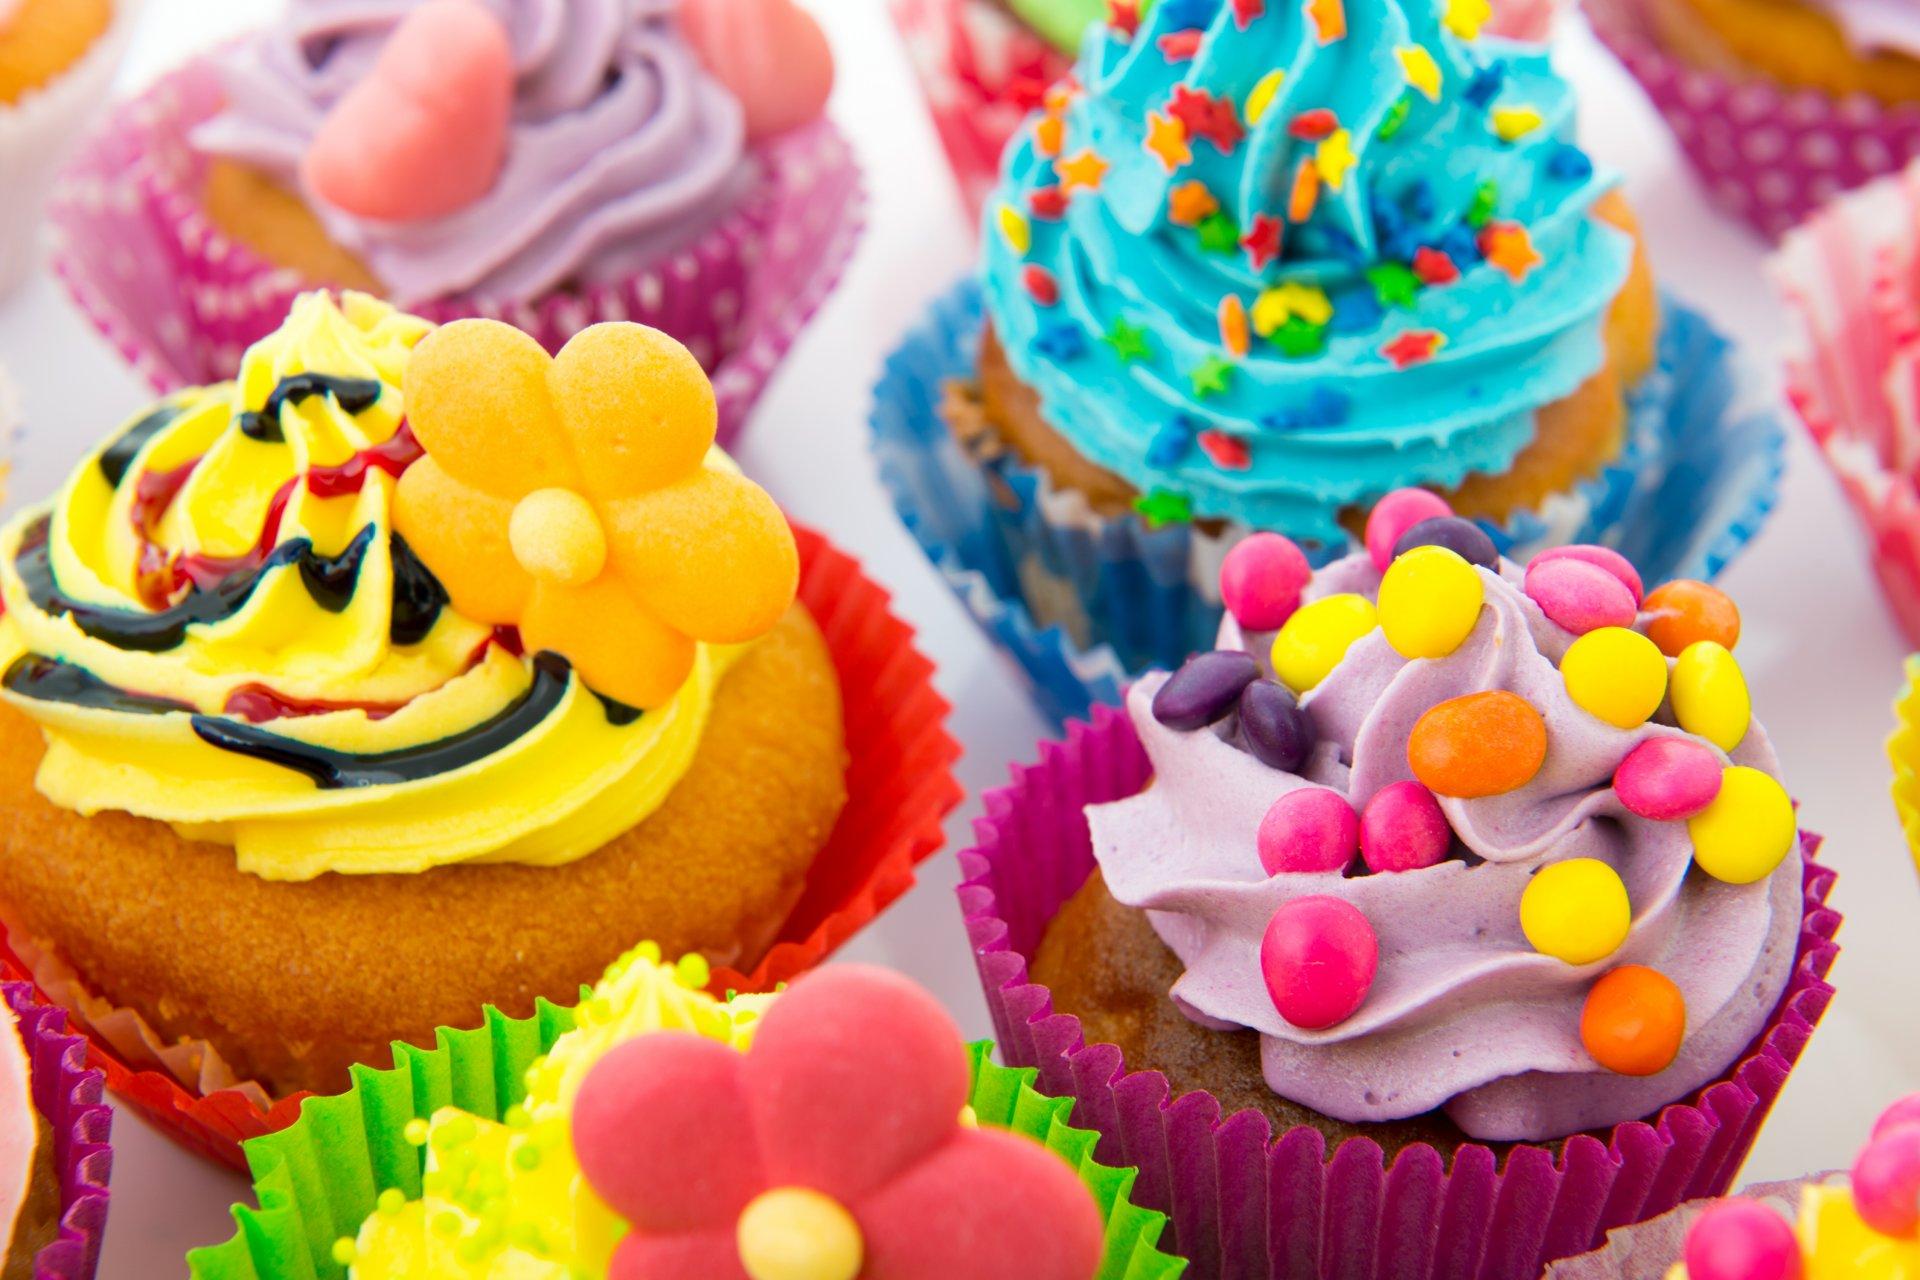 Картинки с тортиками и конфетами, кишинев открытки